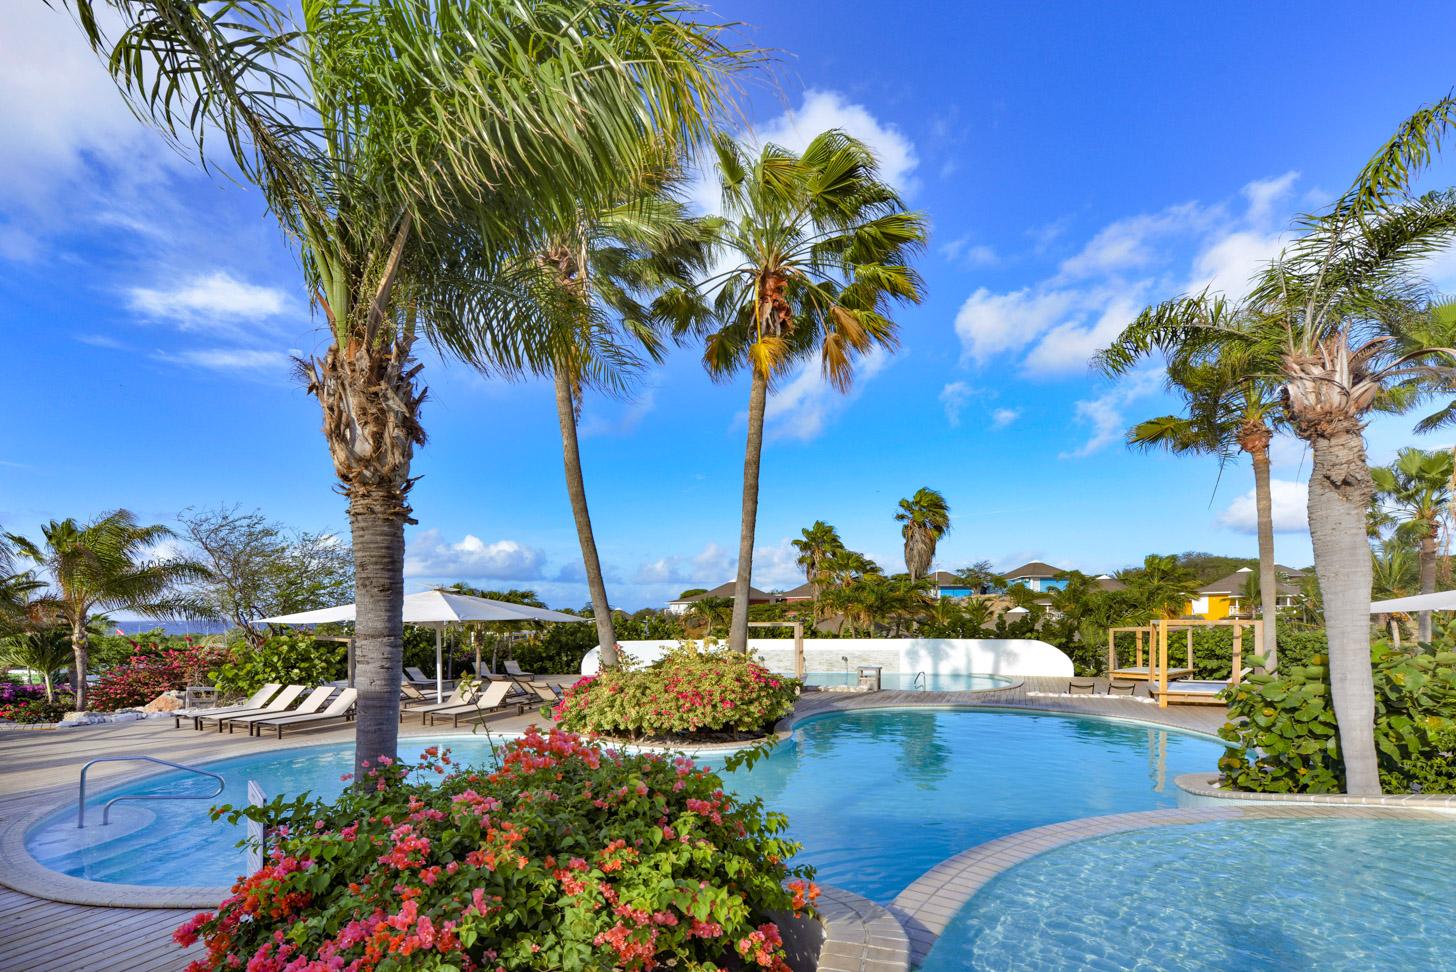 Chocogo Dive & Beach Resort